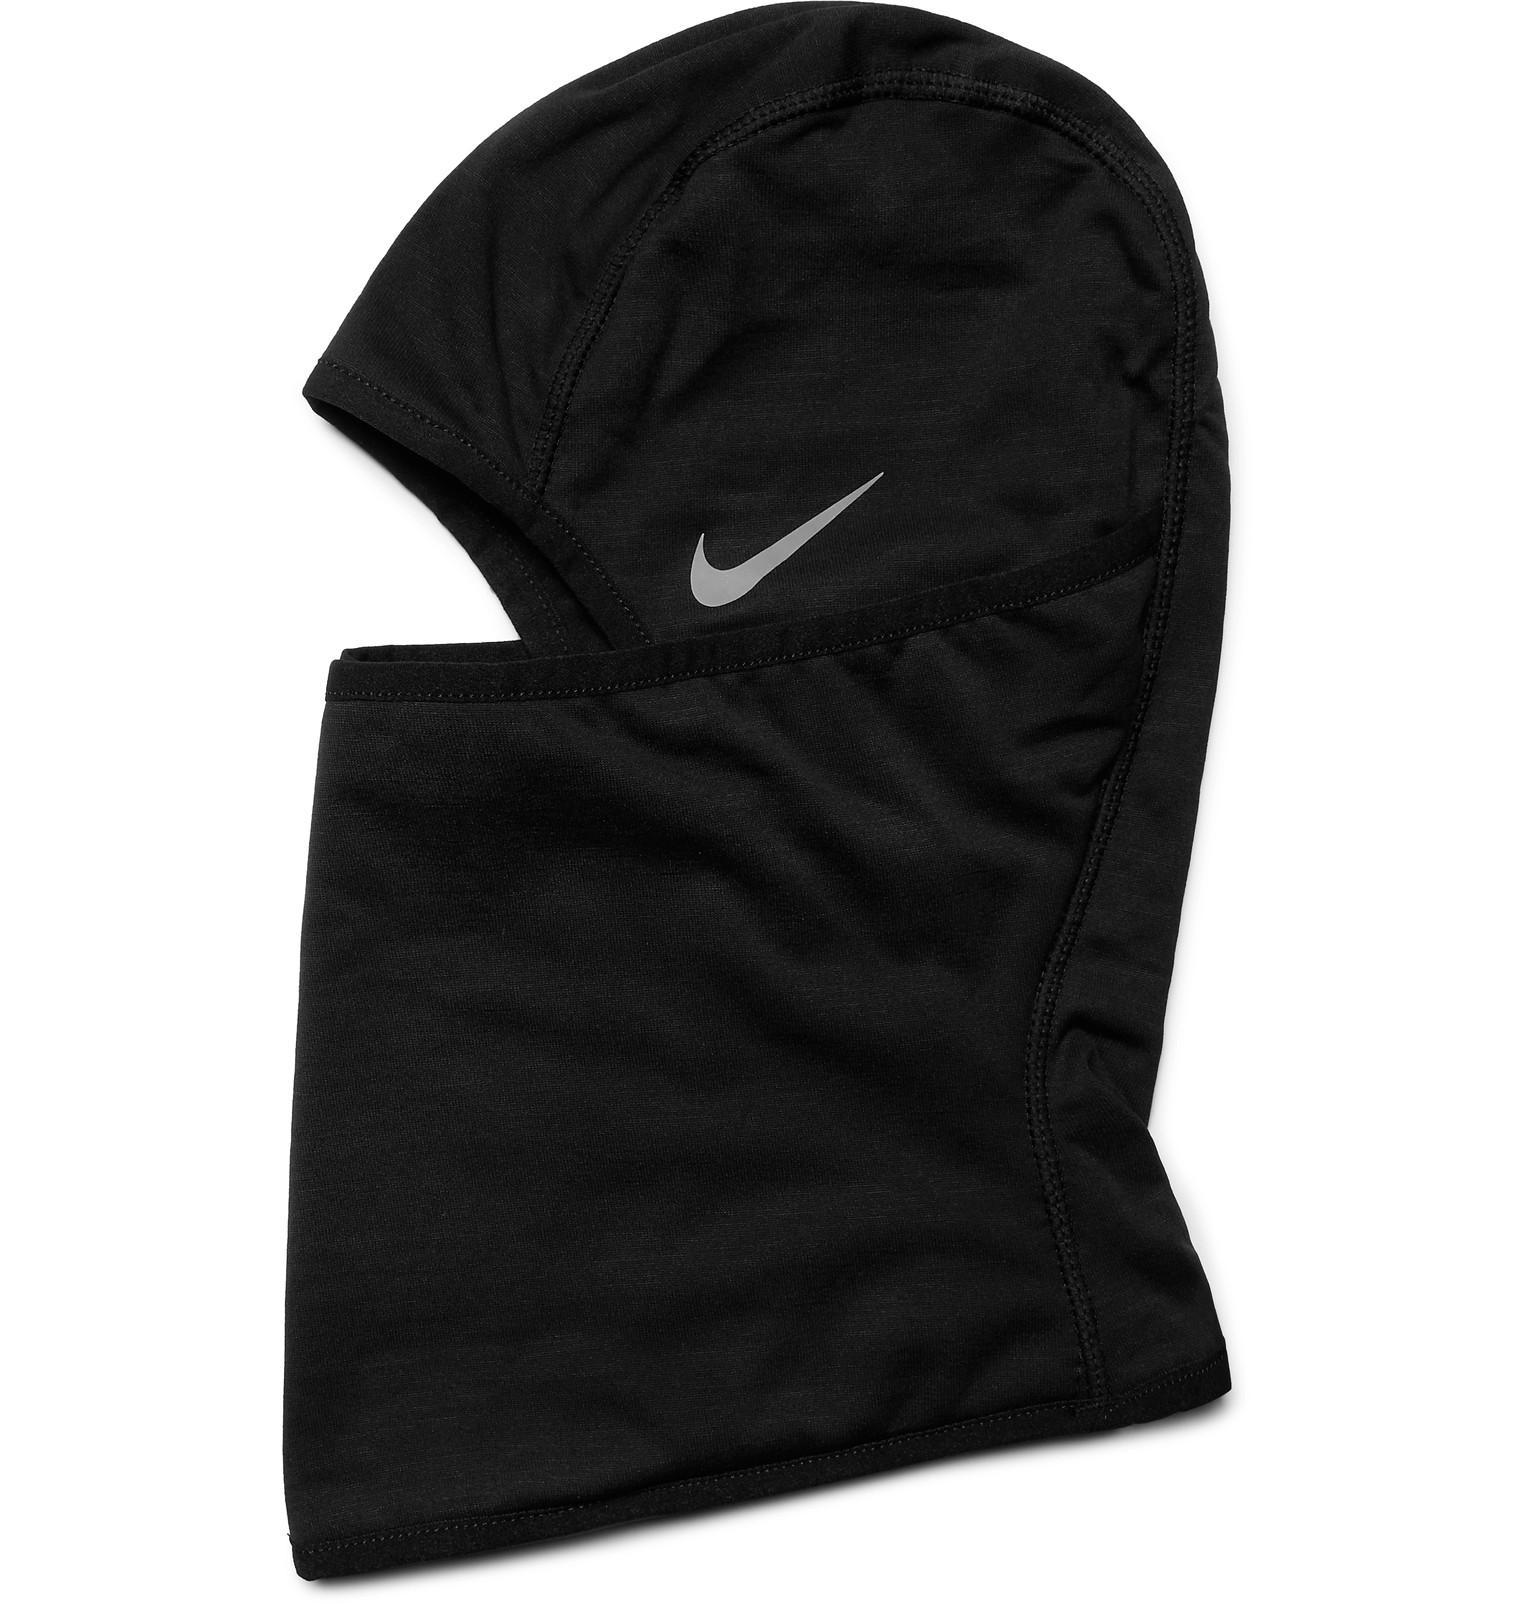 Nike Dri-fit Therma Sphere 2.0 Hood in Black for Men - Lyst 563b6fd58fd6